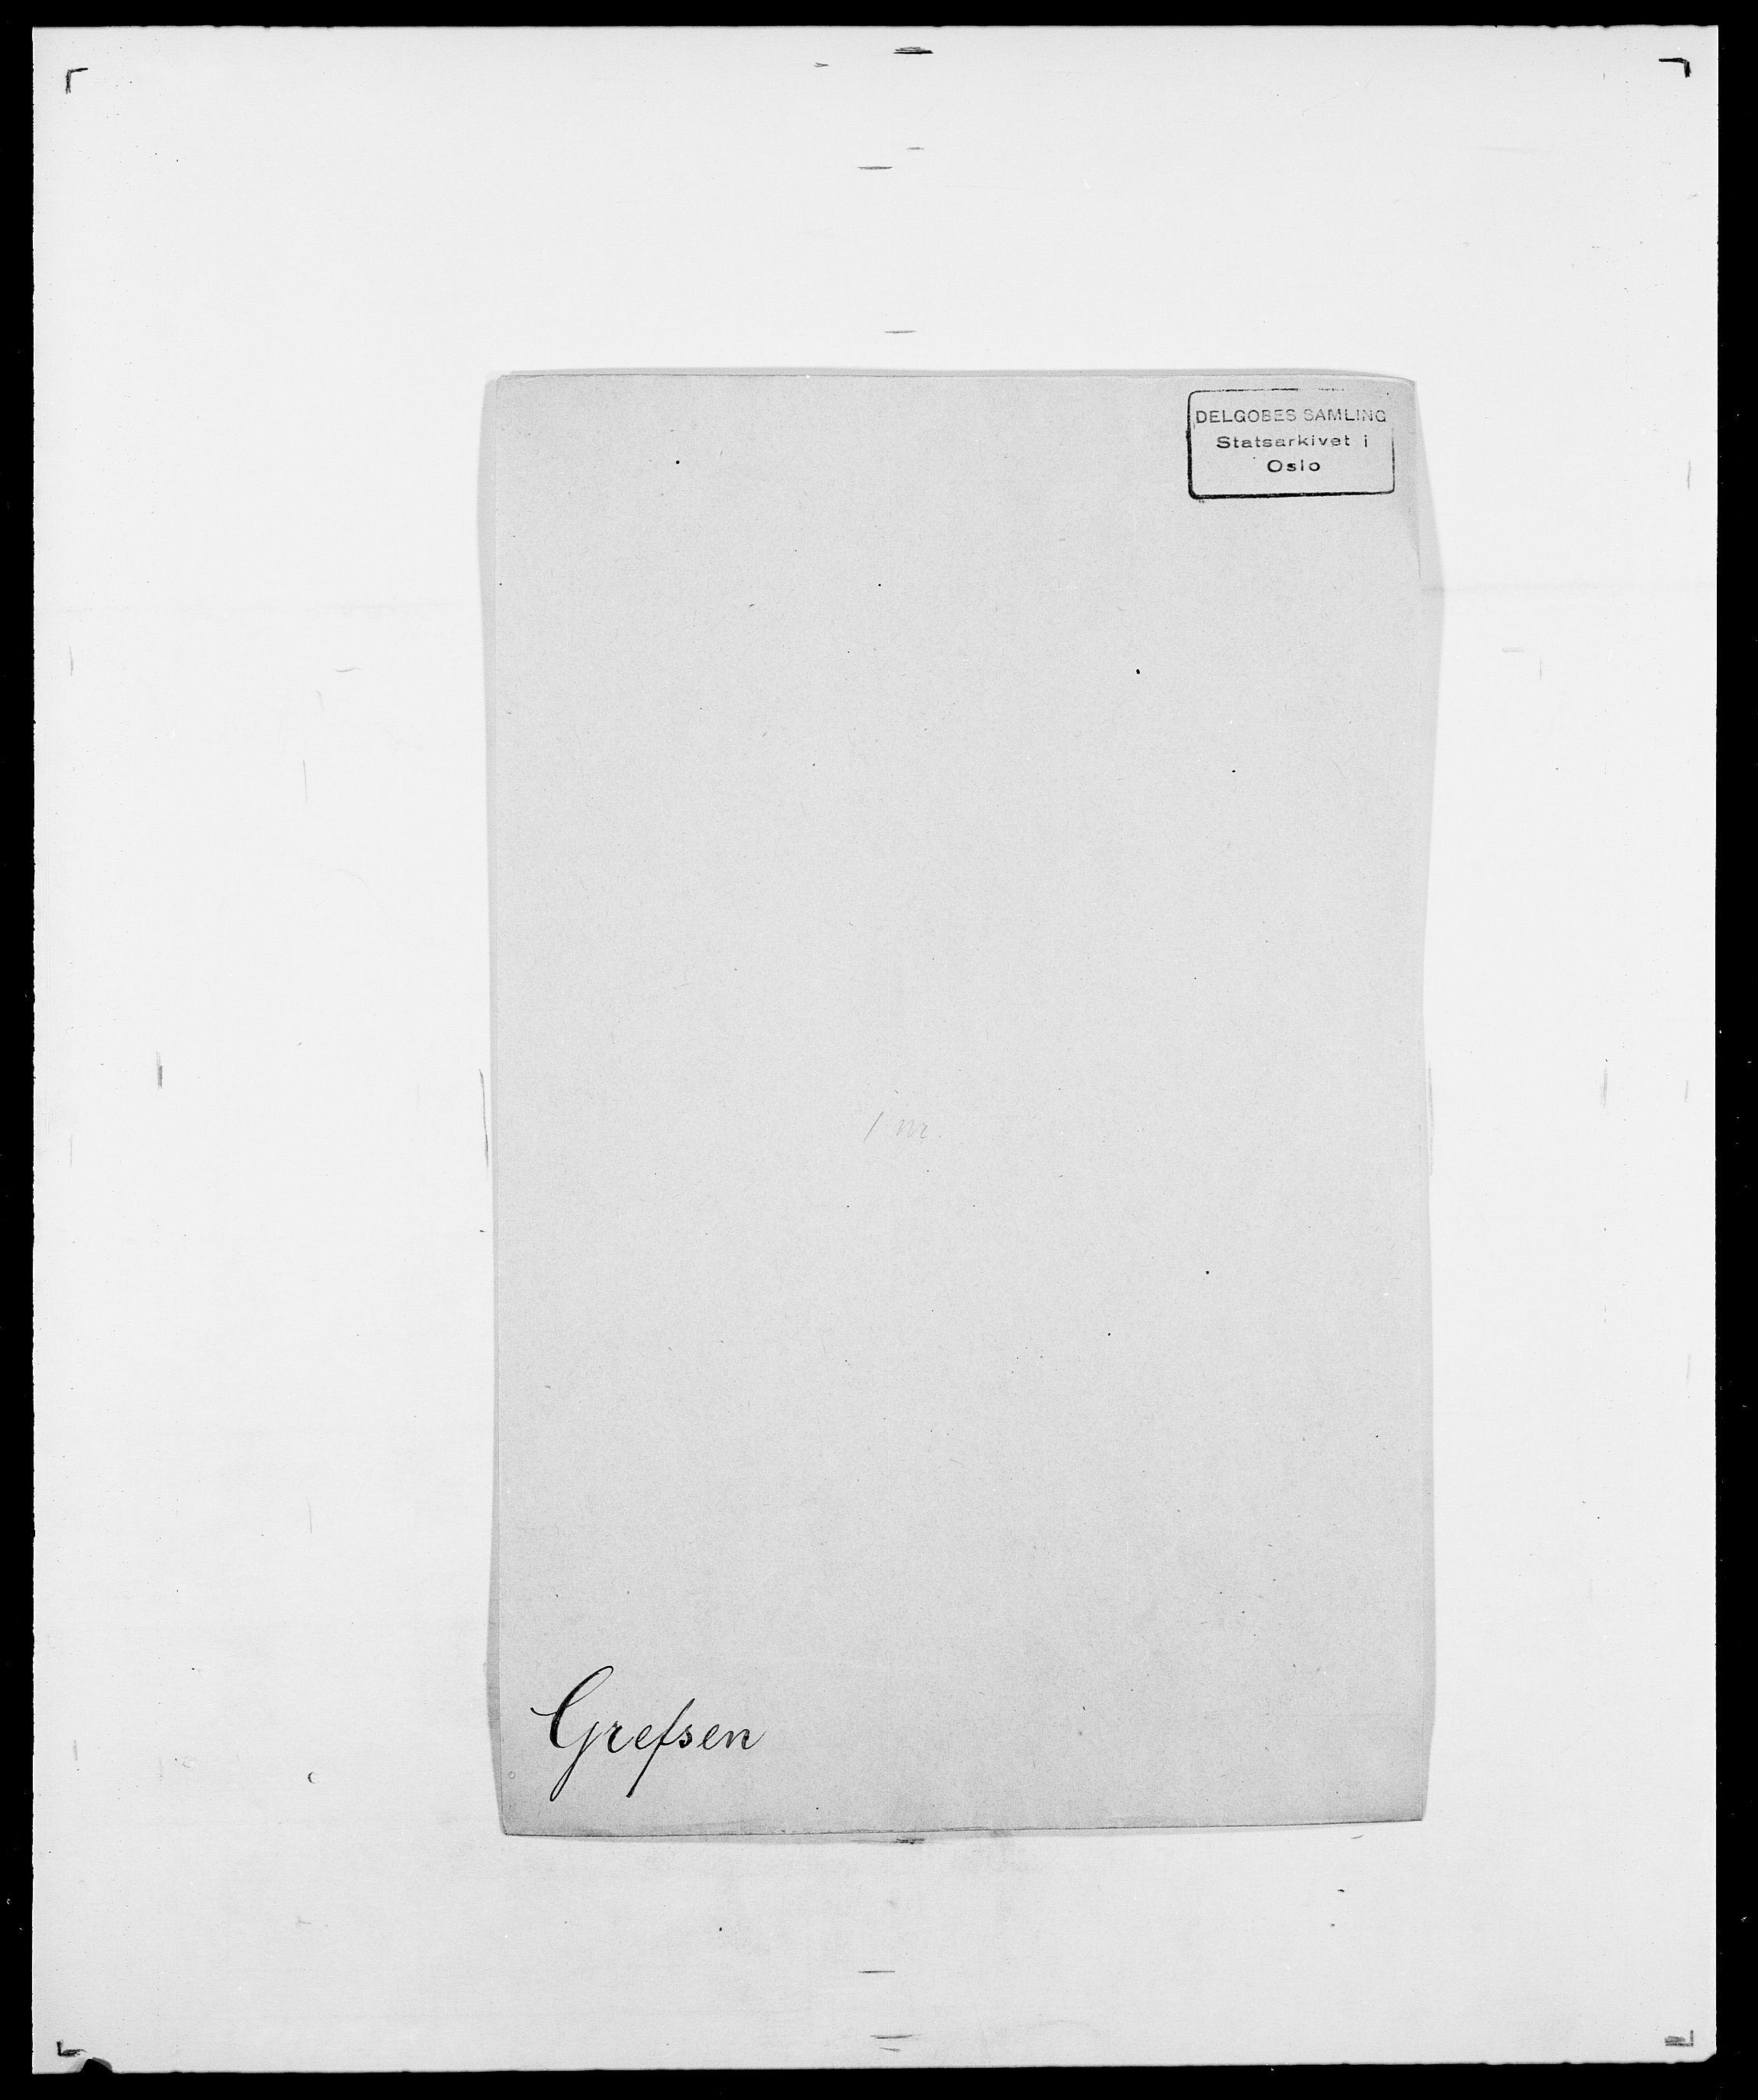 SAO, Delgobe, Charles Antoine - samling, D/Da/L0014: Giebdhausen - Grip, s. 587